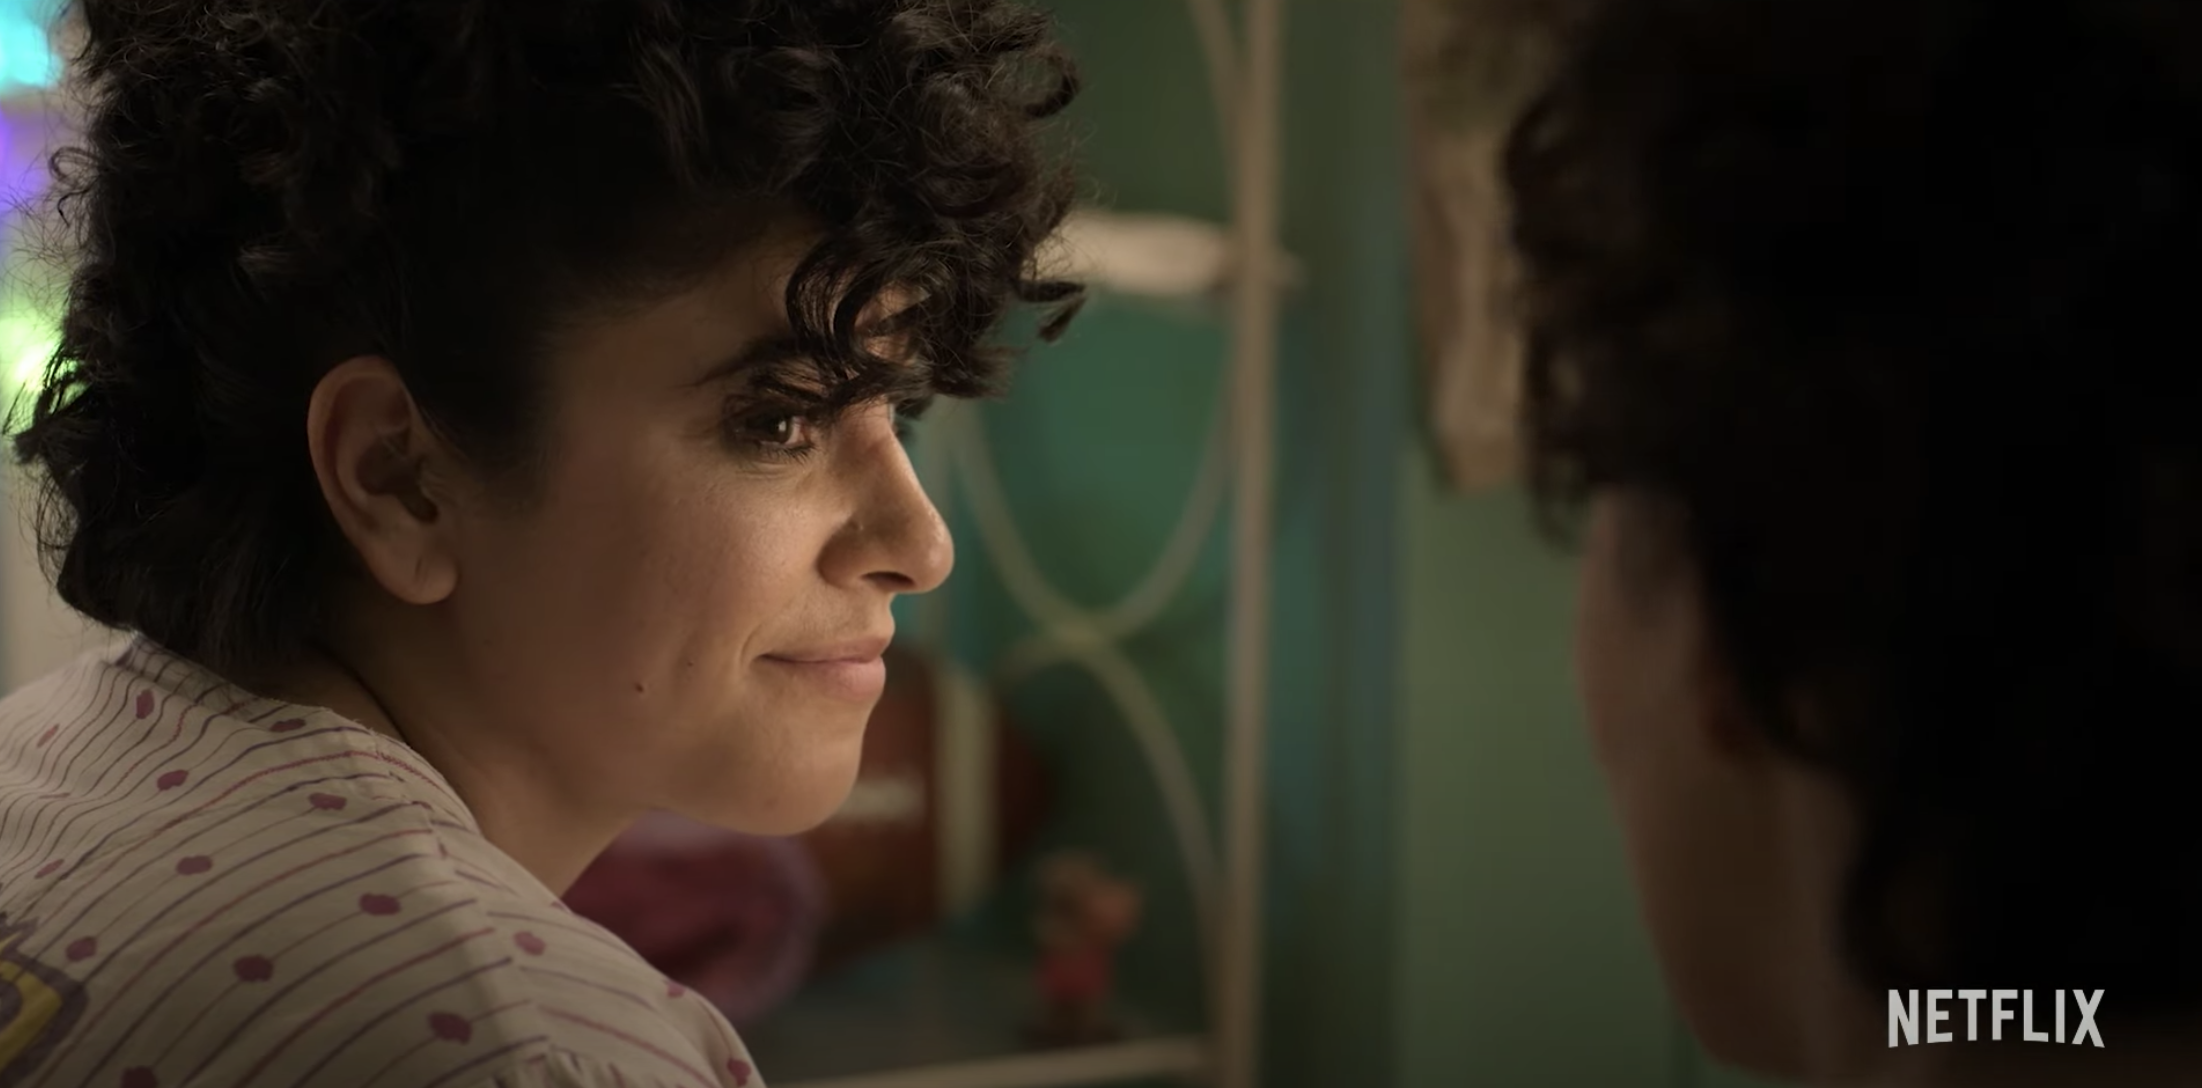 Christian Serratos as Selena speaking with Noemí Gonzalez as her sister Suzette Quintanilla